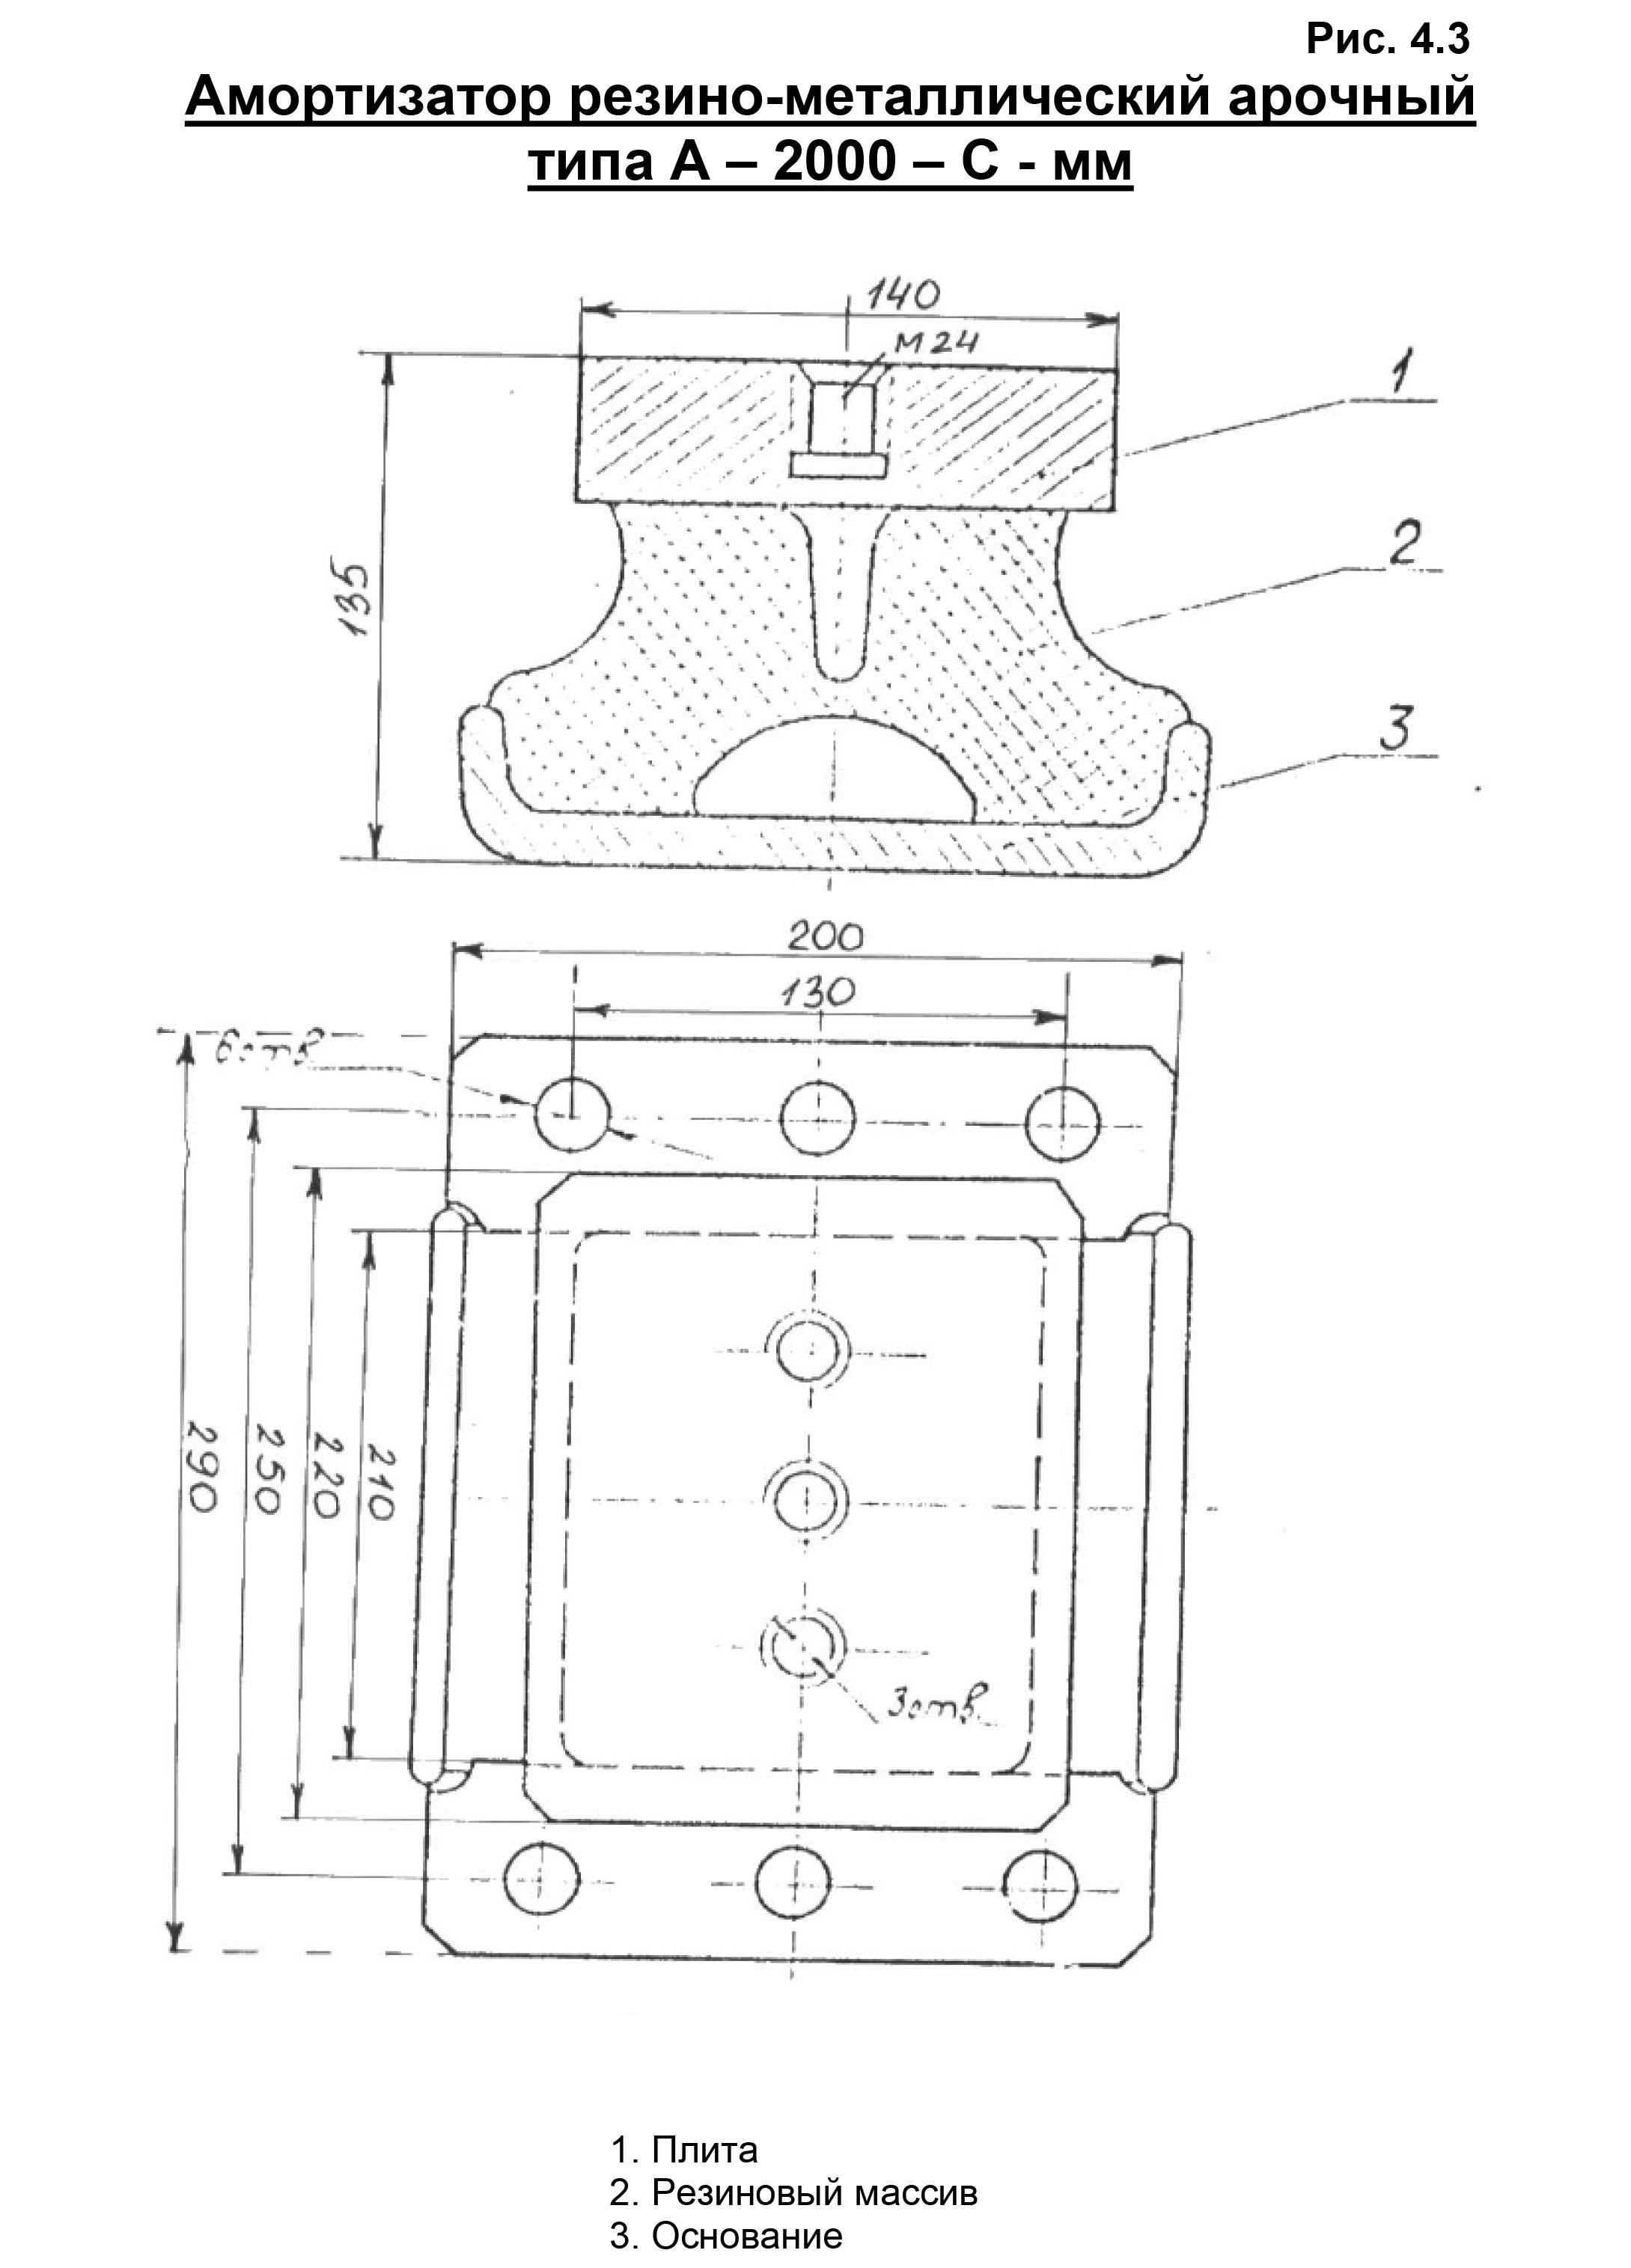 Амортизатор арочного типа А-2000